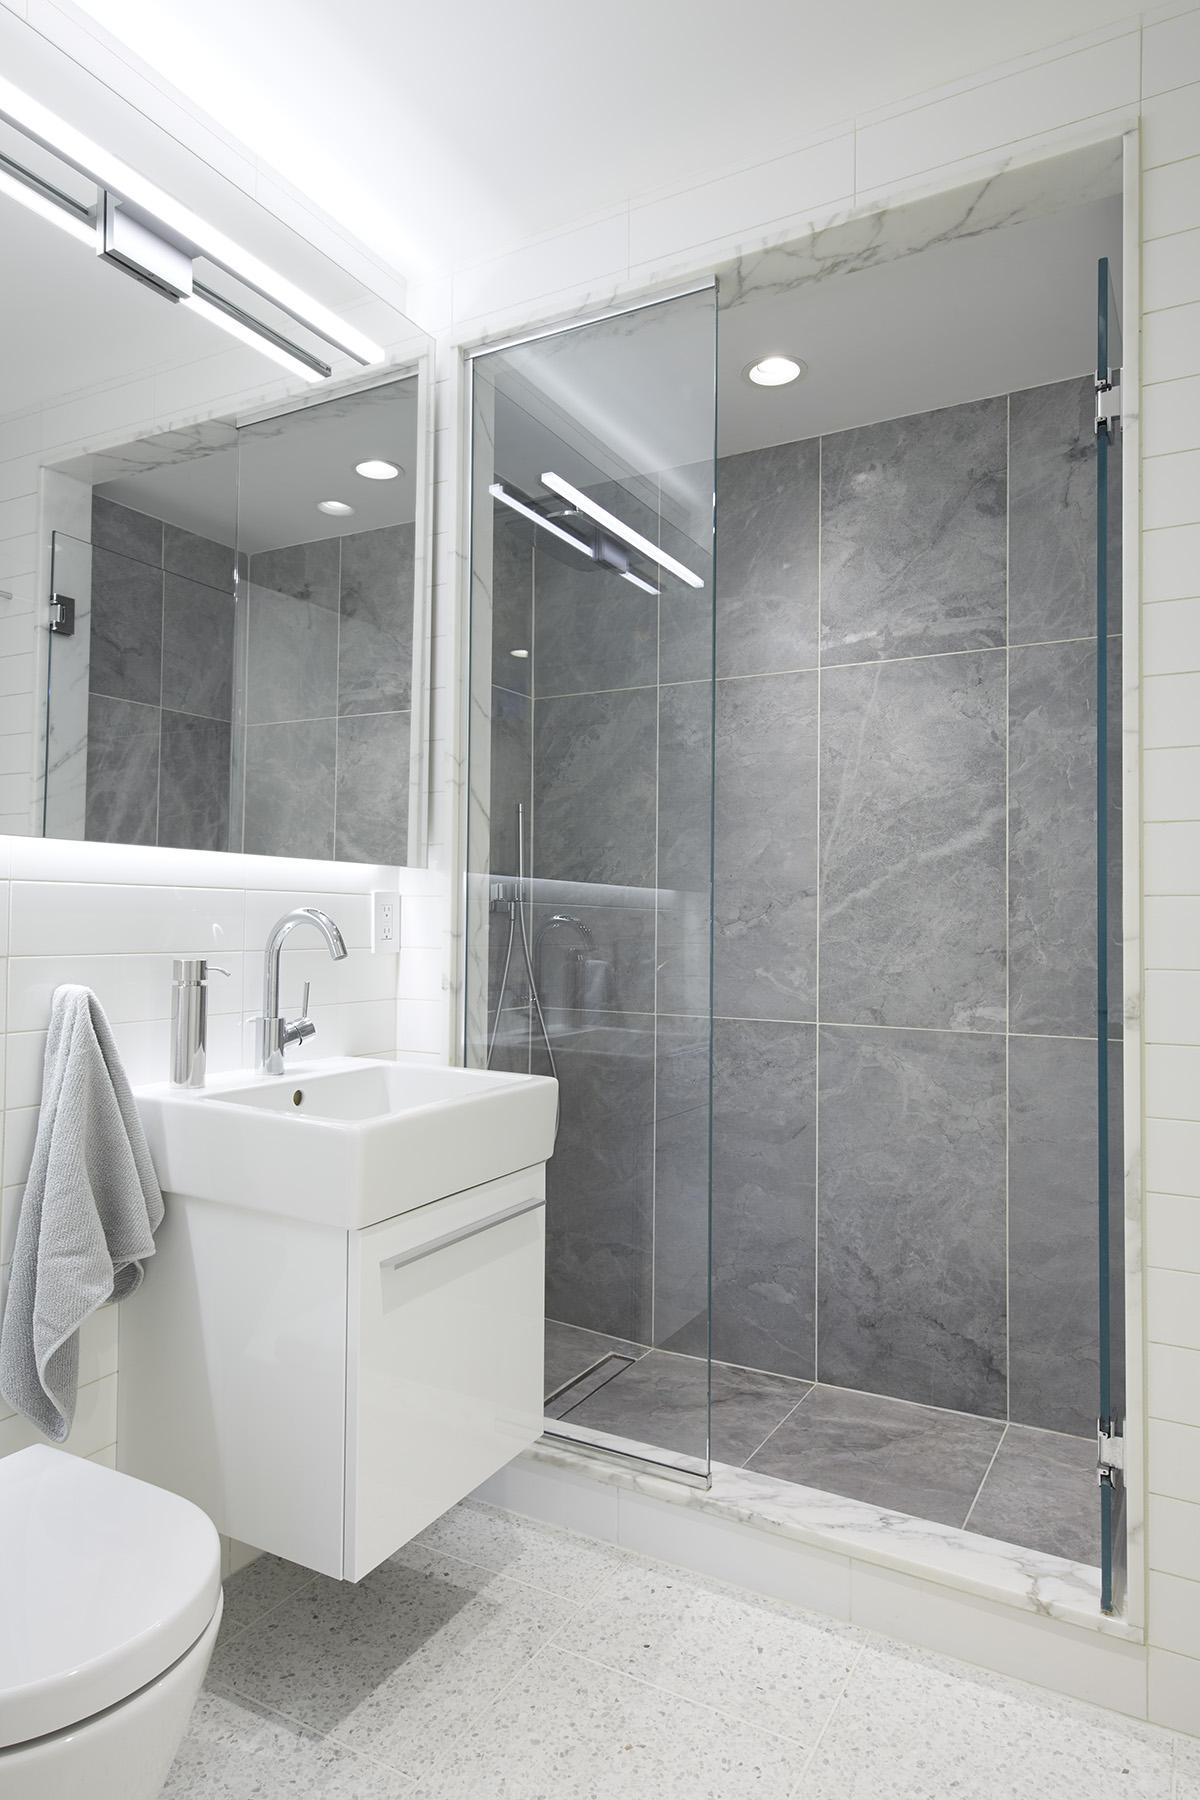 STADT Architecture, Gramercy Apartment, ABC Stone, Blue de Savoie, Duravit, STADT, nyc architects, ny apartment renovation